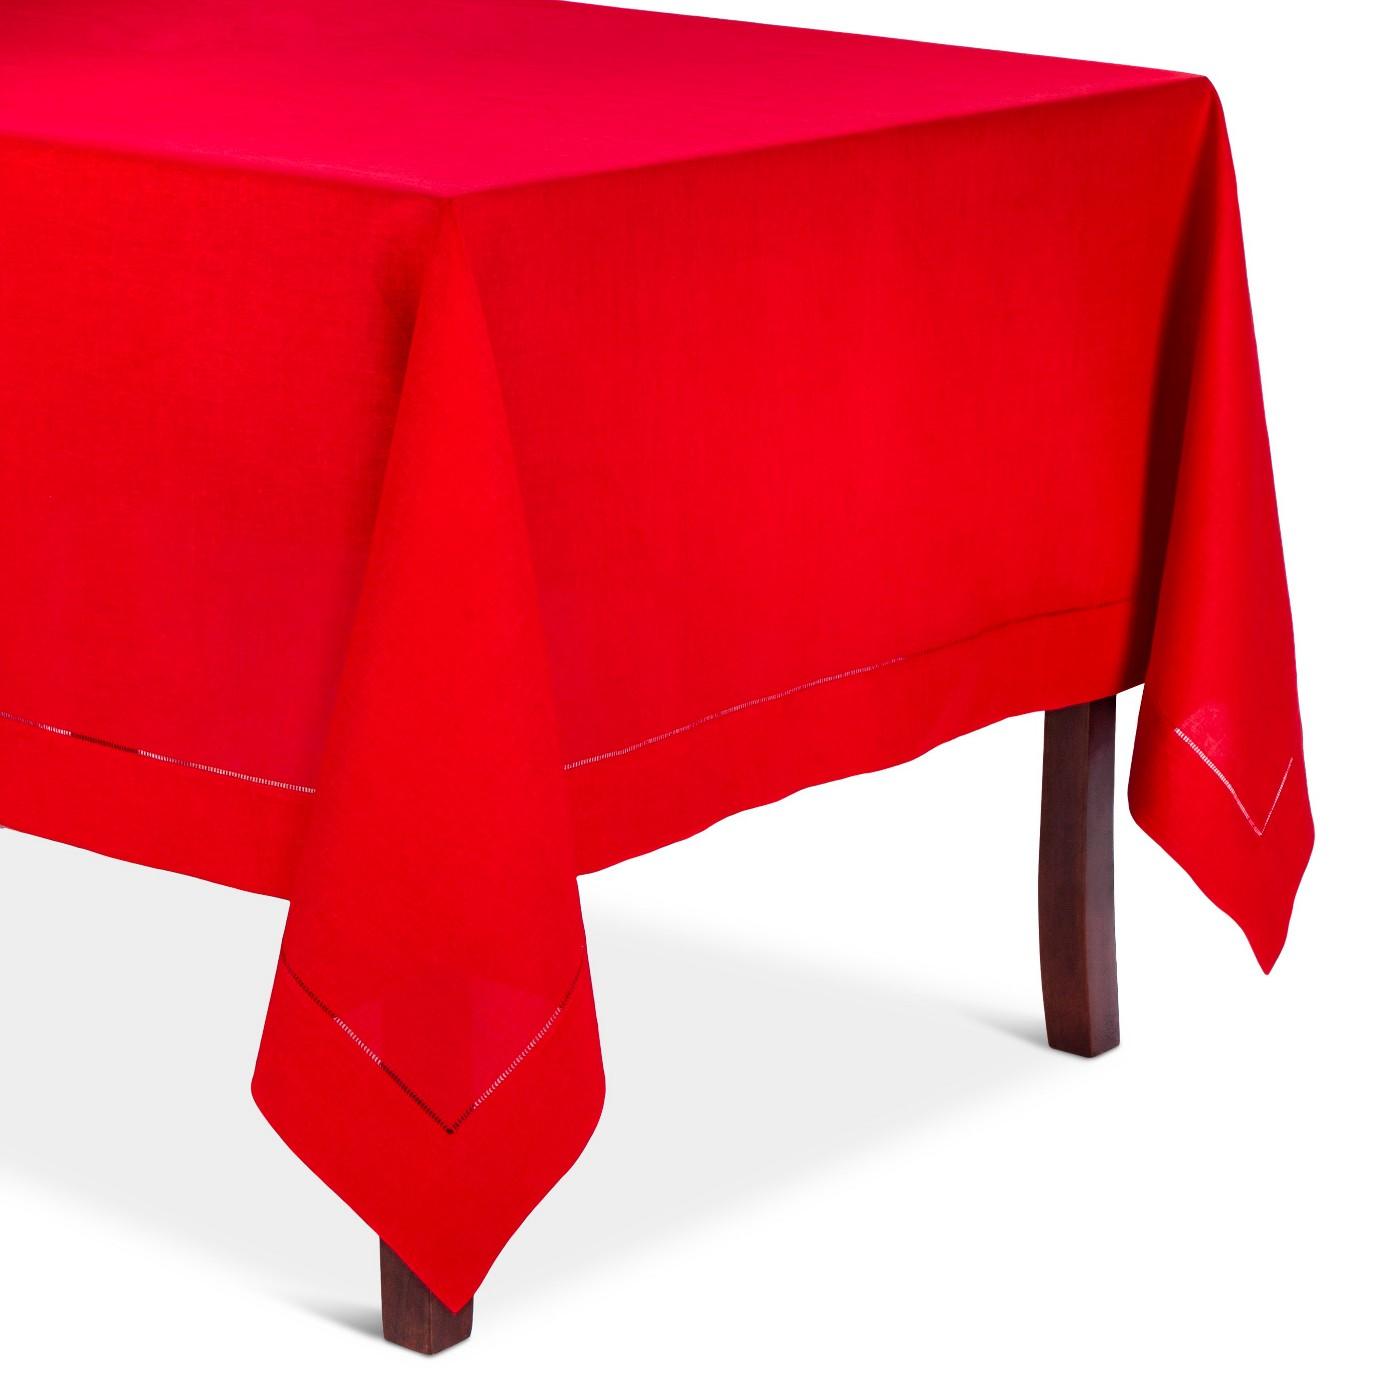 Red Hempstitched Tablecloth, $66.49-.jpeg